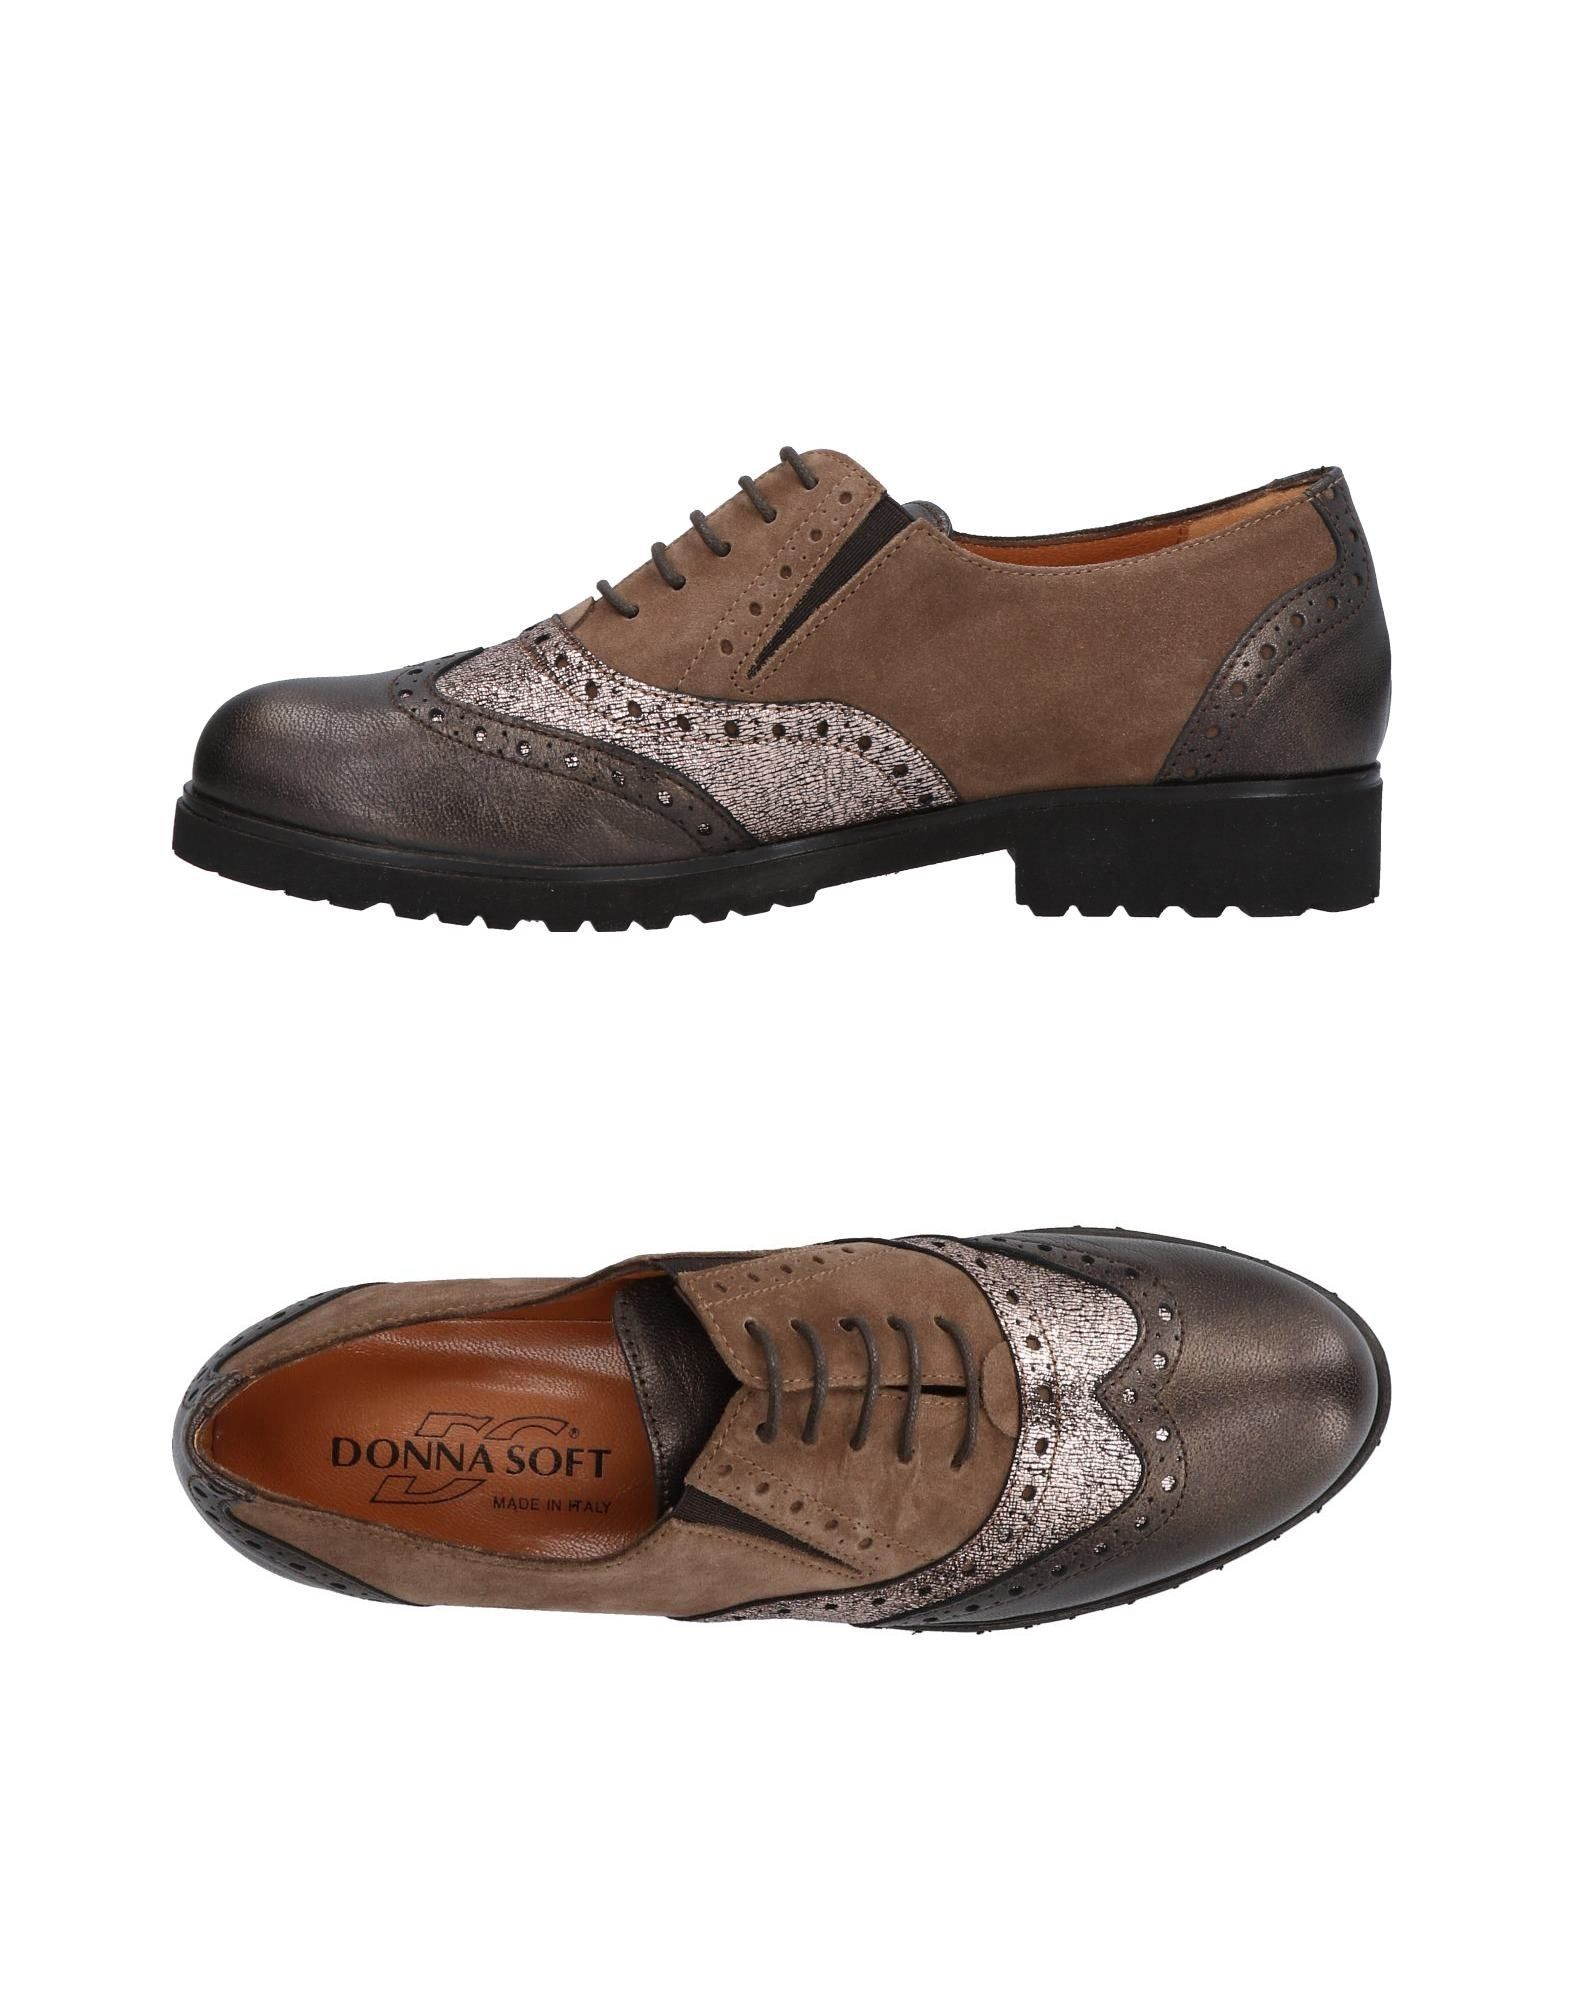 Donna Soft Schnürschuhe Damen  11486863NB Gute Qualität beliebte Schuhe